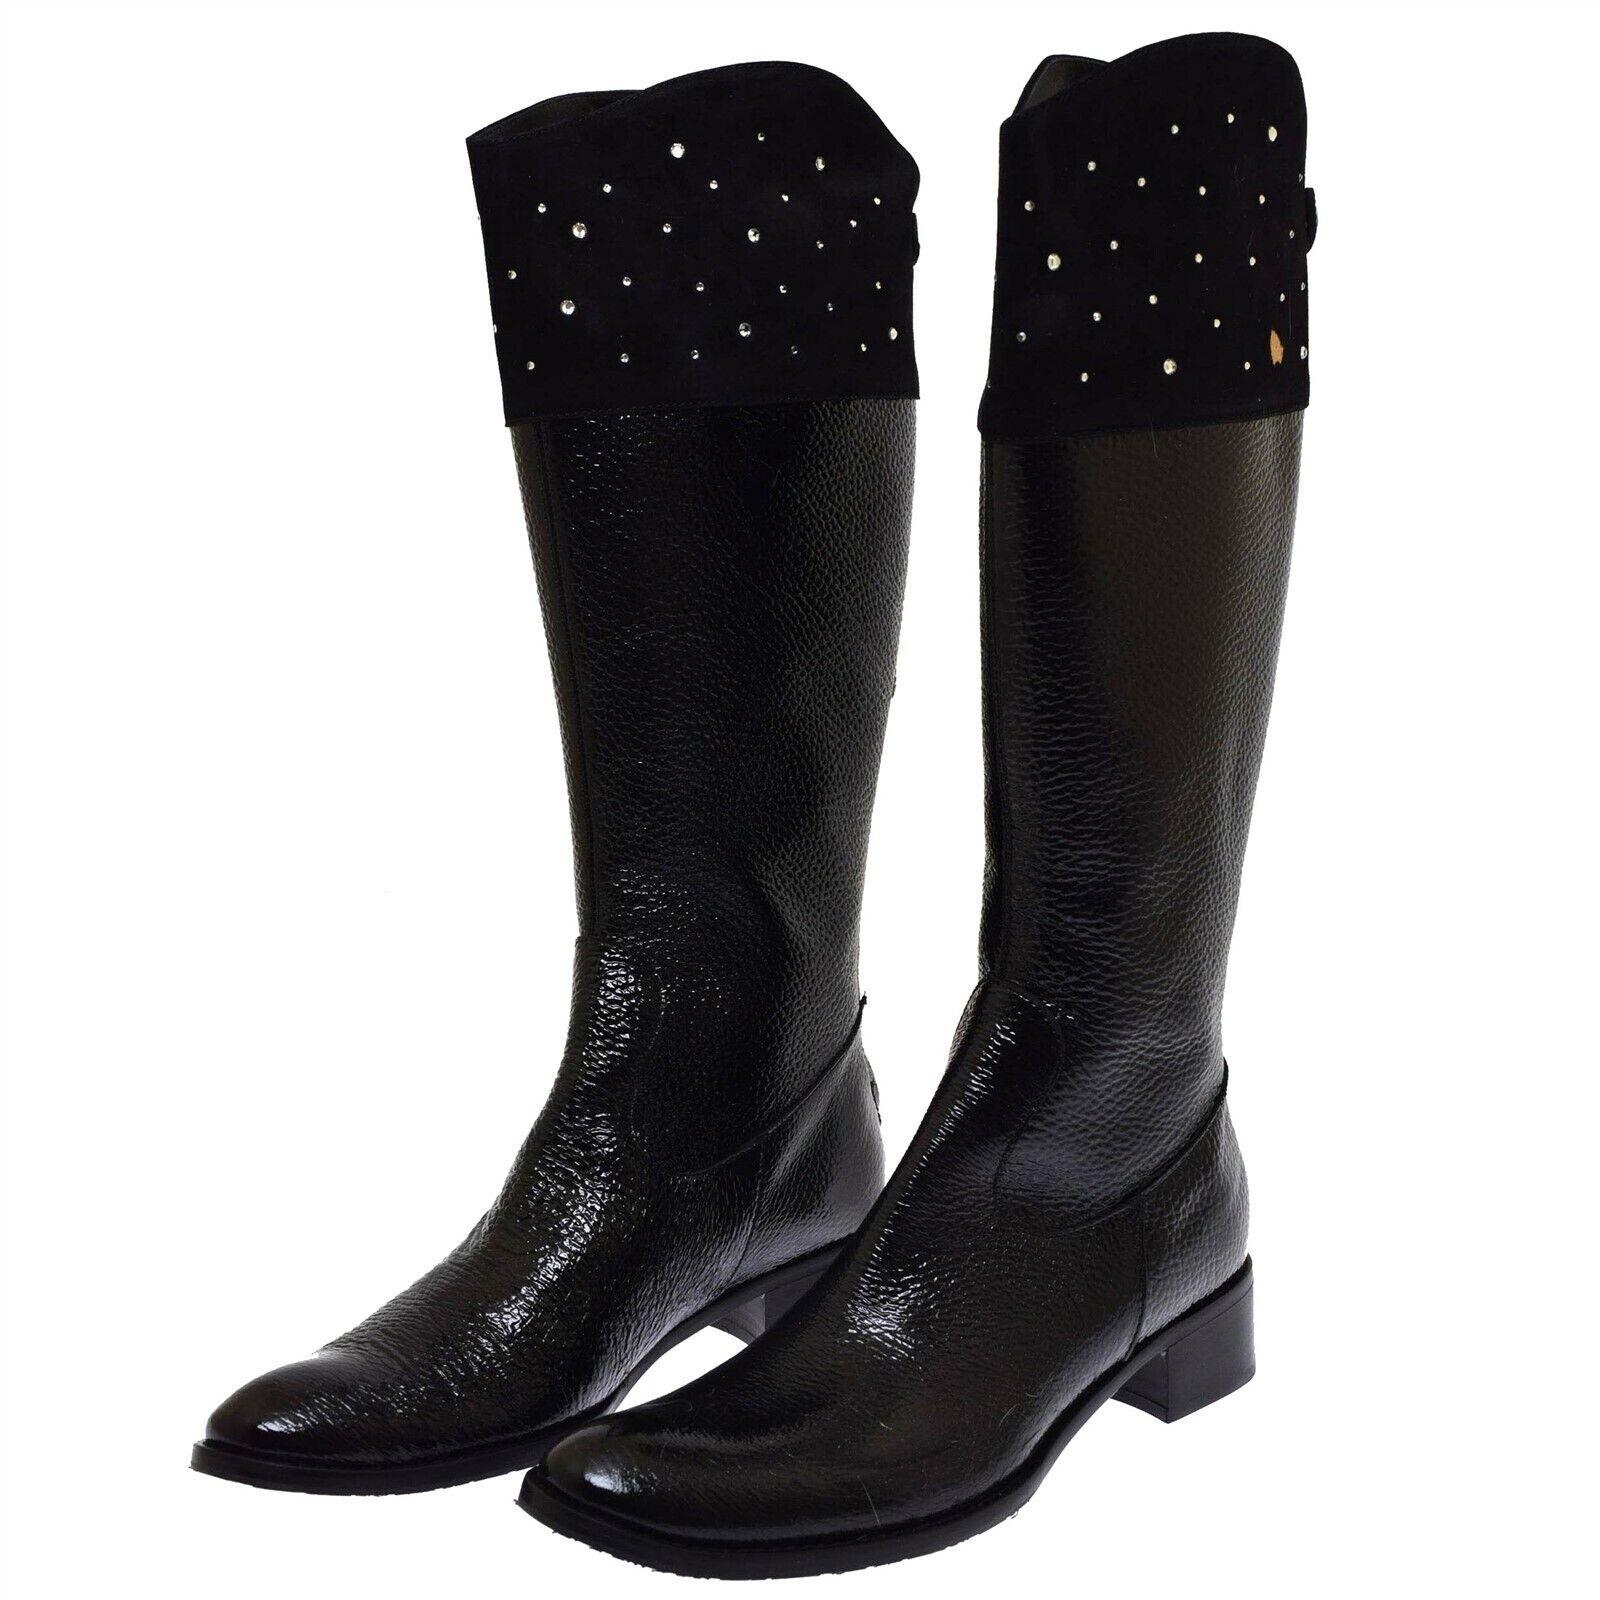 Fiorangelo Black Patent Leather Suede Rhinestone Women's Boots 40 US 10 NEW